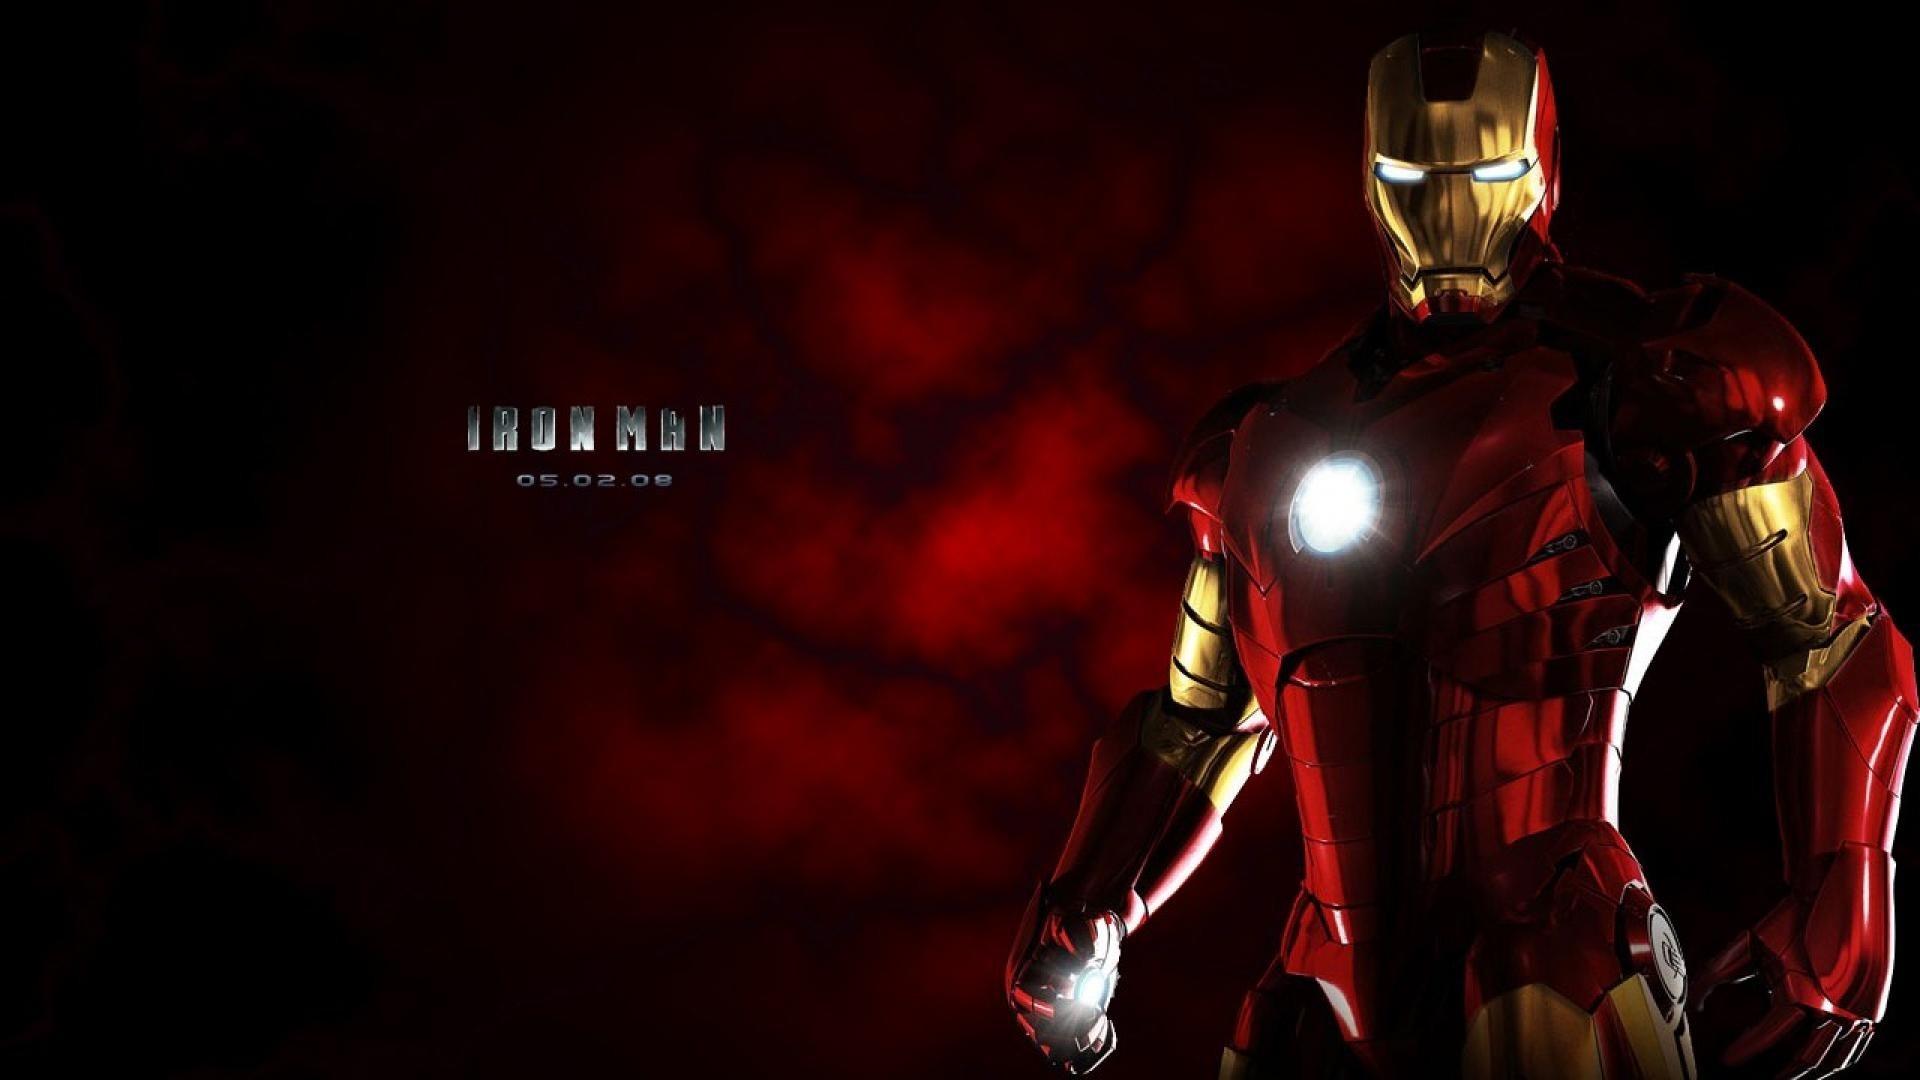 136 Iron Man Jarvis Live